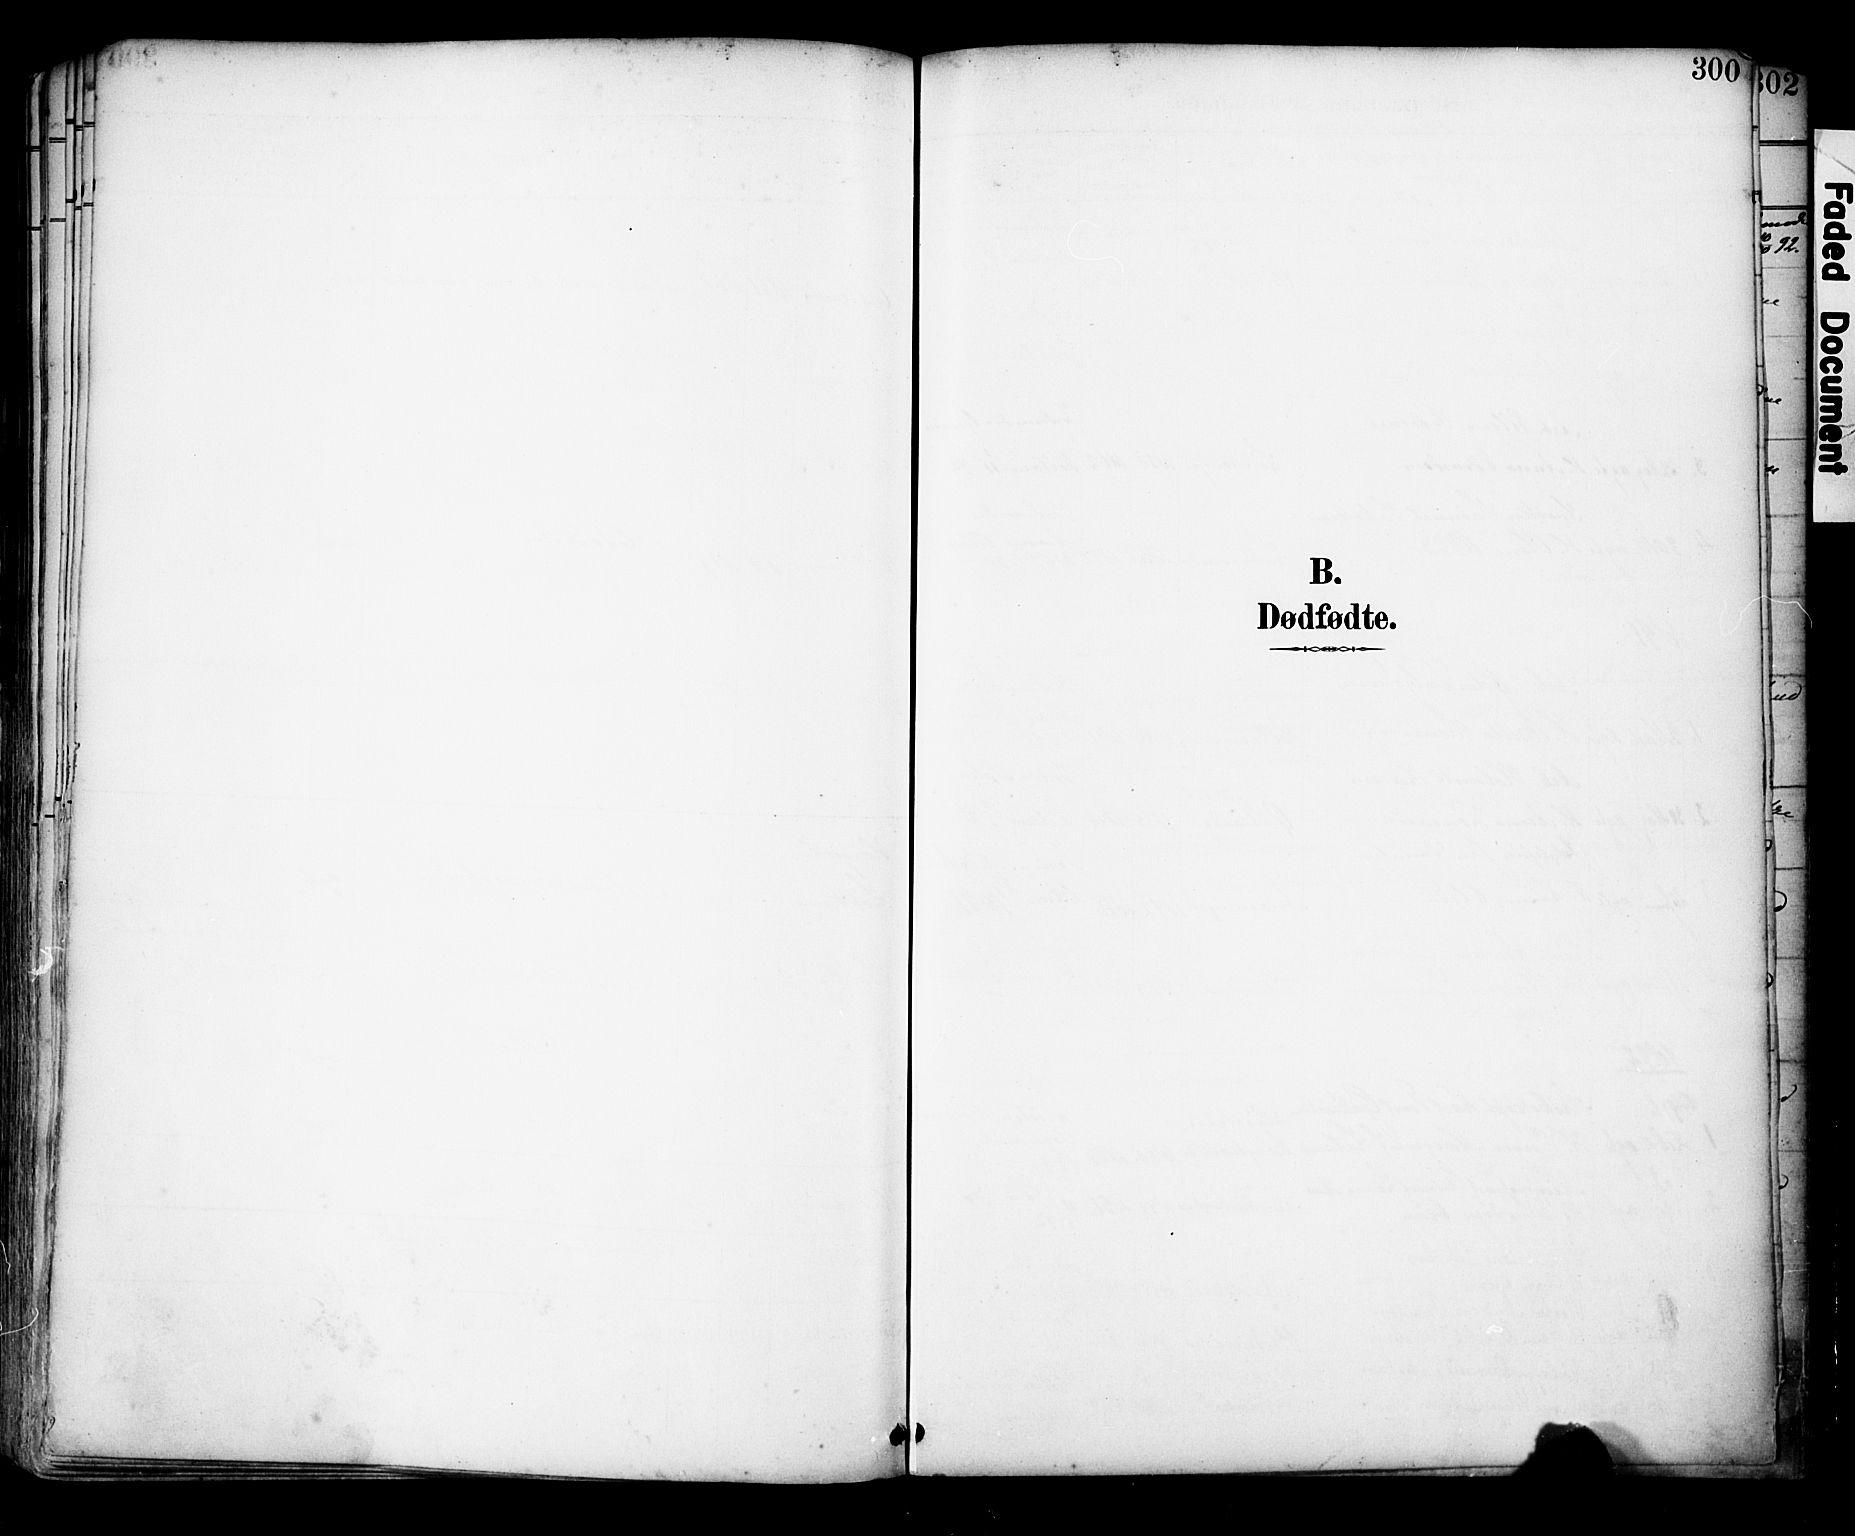 SAST, Domkirken sokneprestkontor, 30/30BA/L0030: Ministerialbok nr. A 29, 1889-1902, s. 300